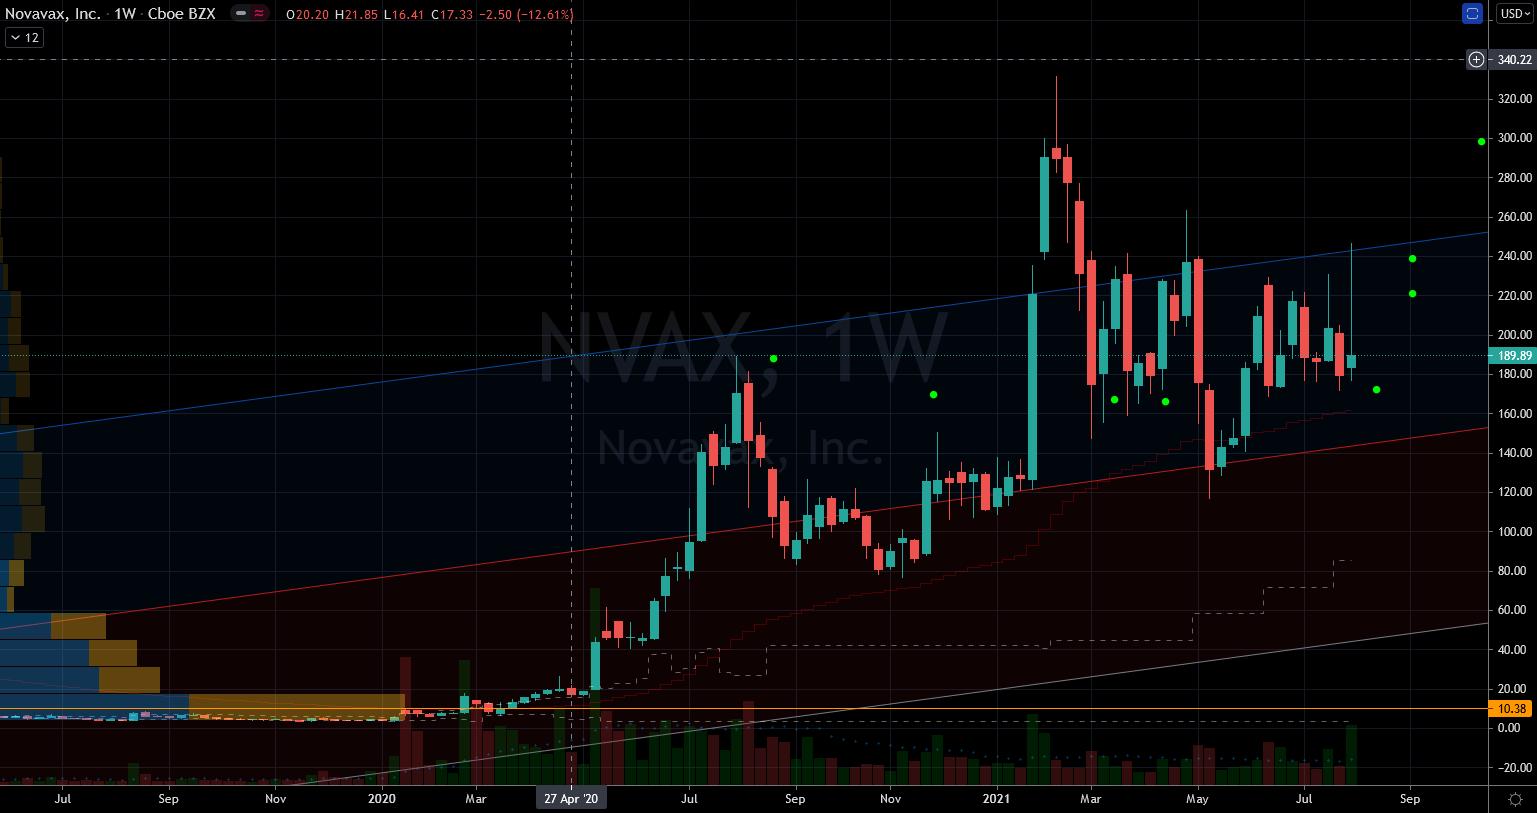 Stocks to Buy: Novavax (NVAX) Stock Chart Showing Support Below